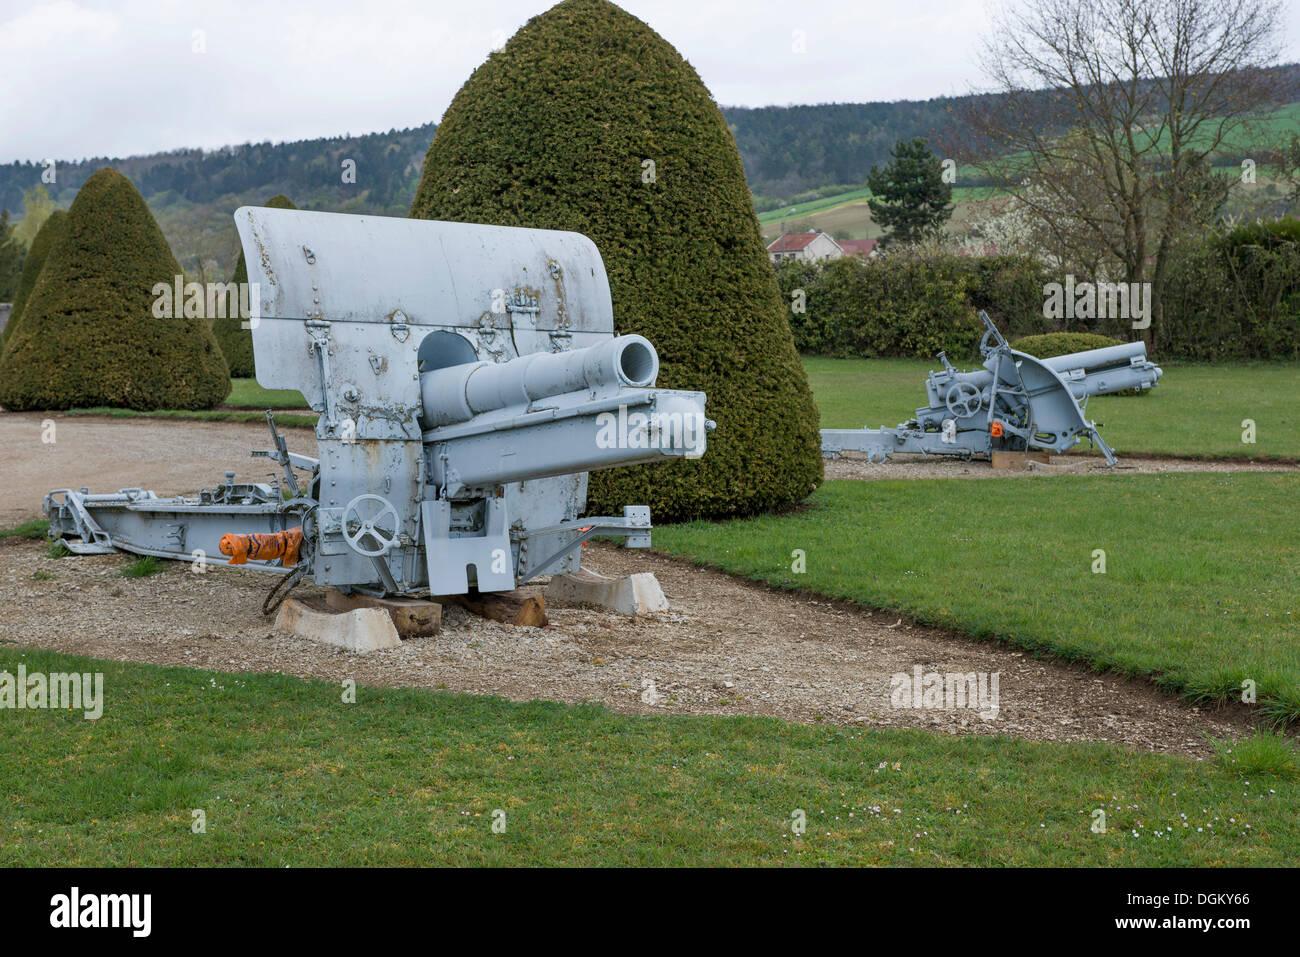 Cannon at a military cemetery, Battle of Verdun, First World War, Verdun, Lorraine, France, Europe - Stock Image